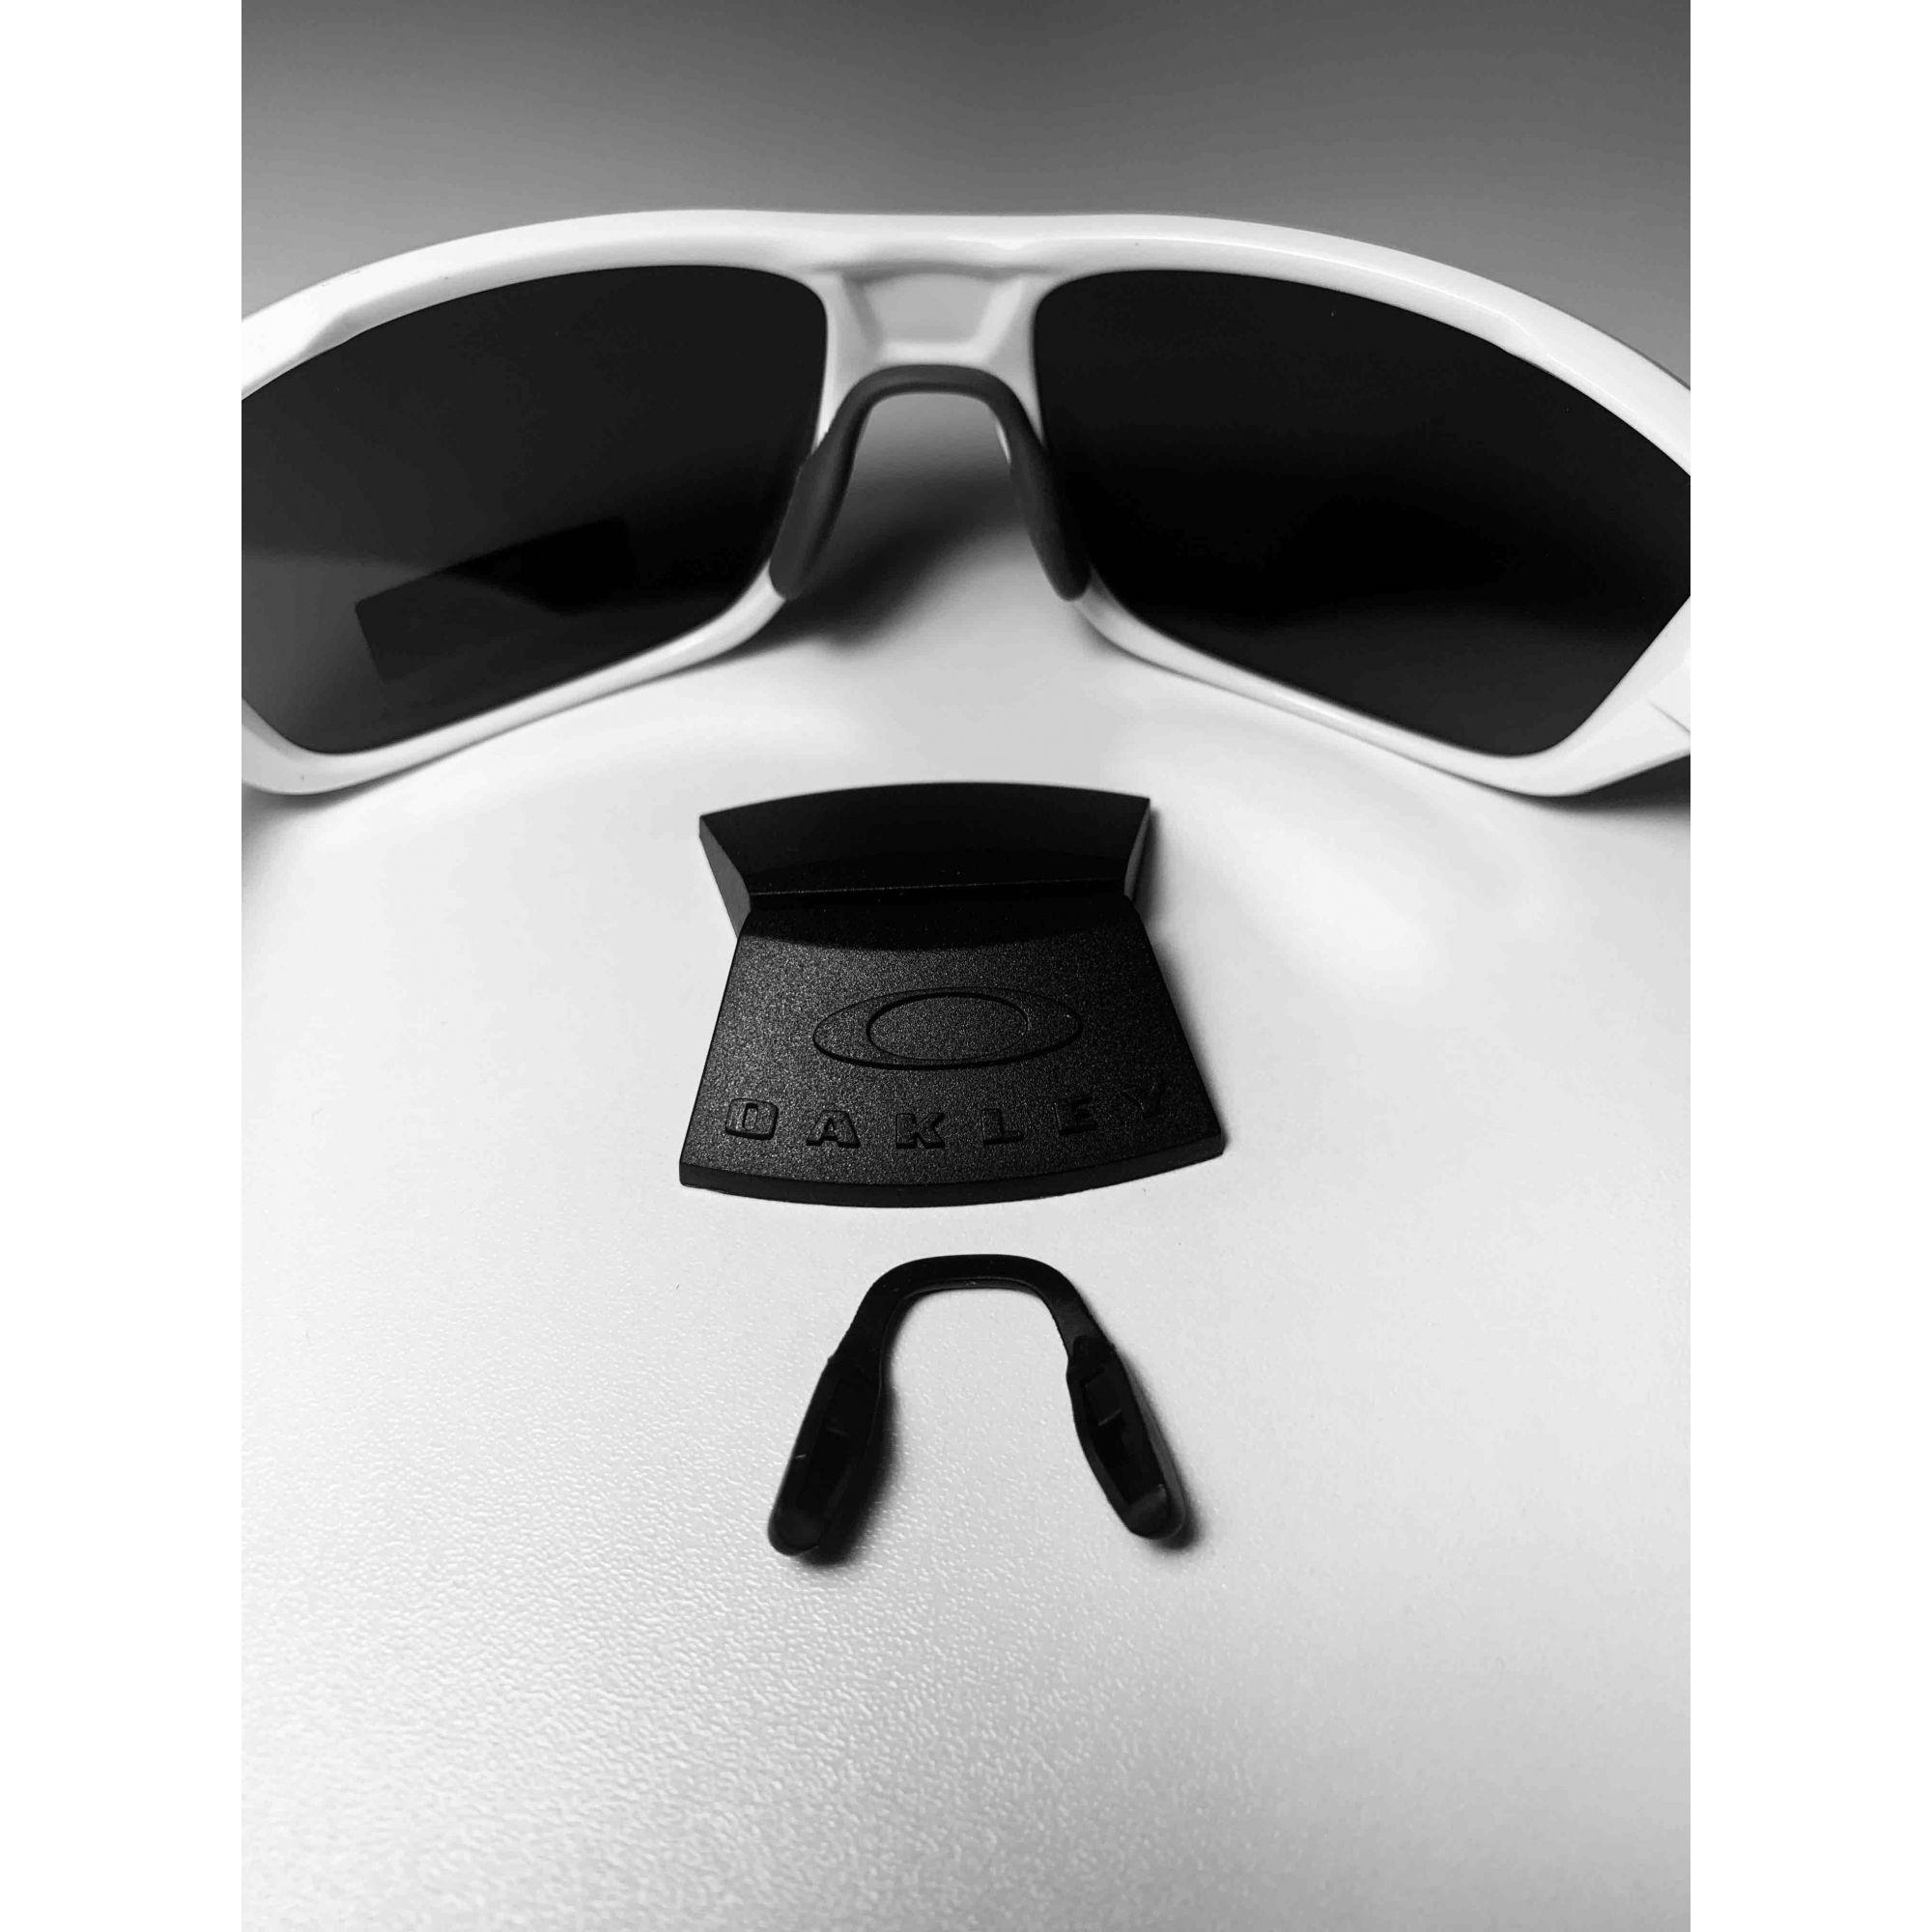 Borracha Nasal Para Óculos Oakley Split Shot e Targetline